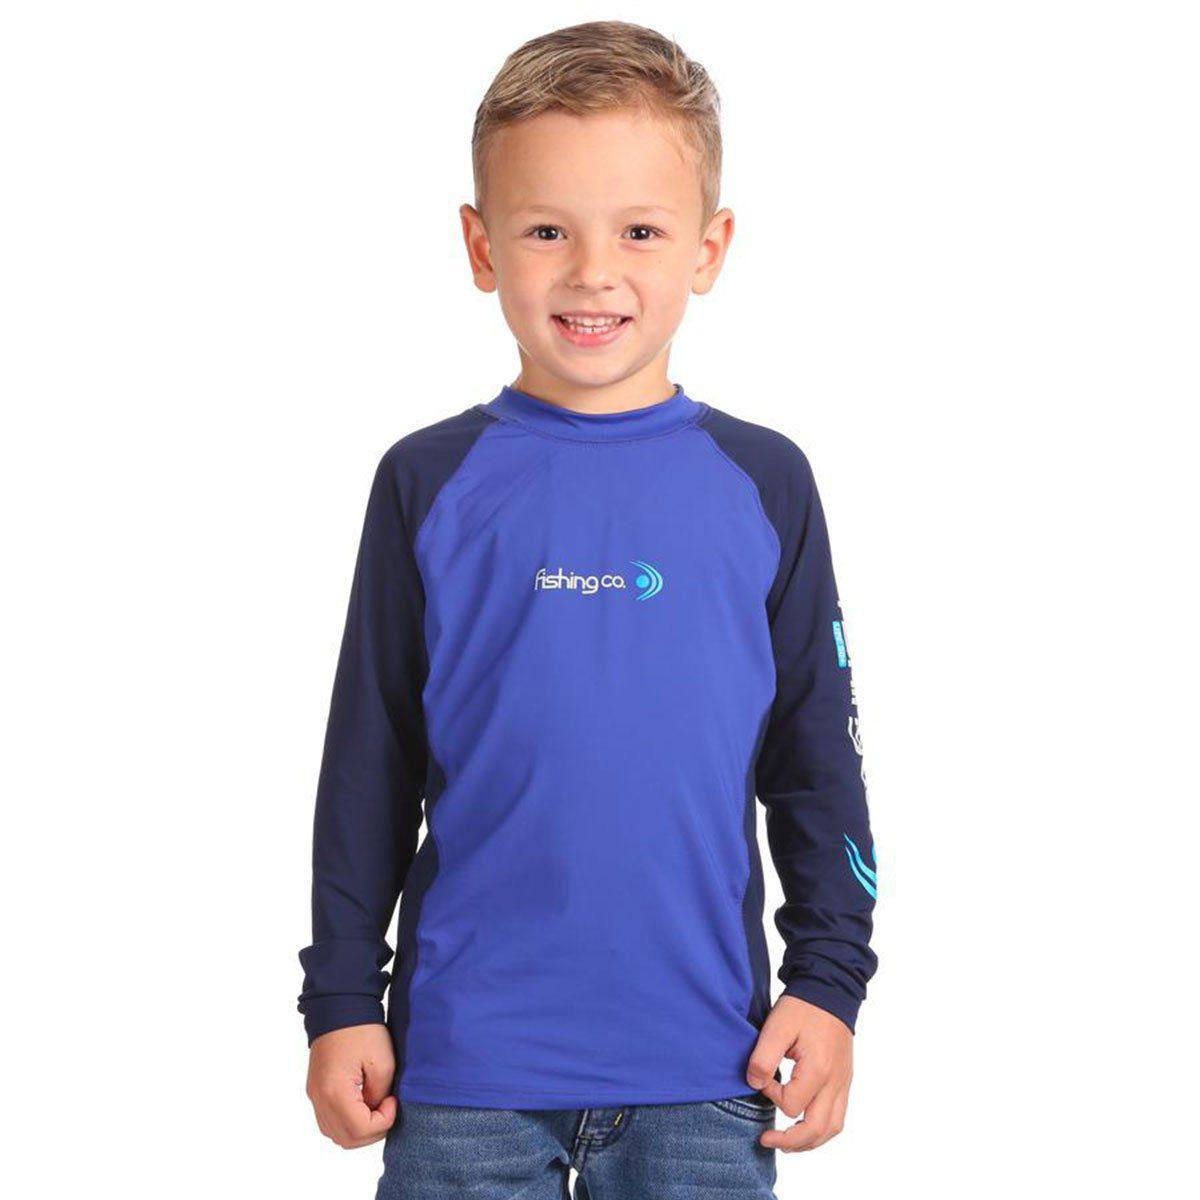 Camiseta Infantil Fishing Co Recorte Royal e Marinho